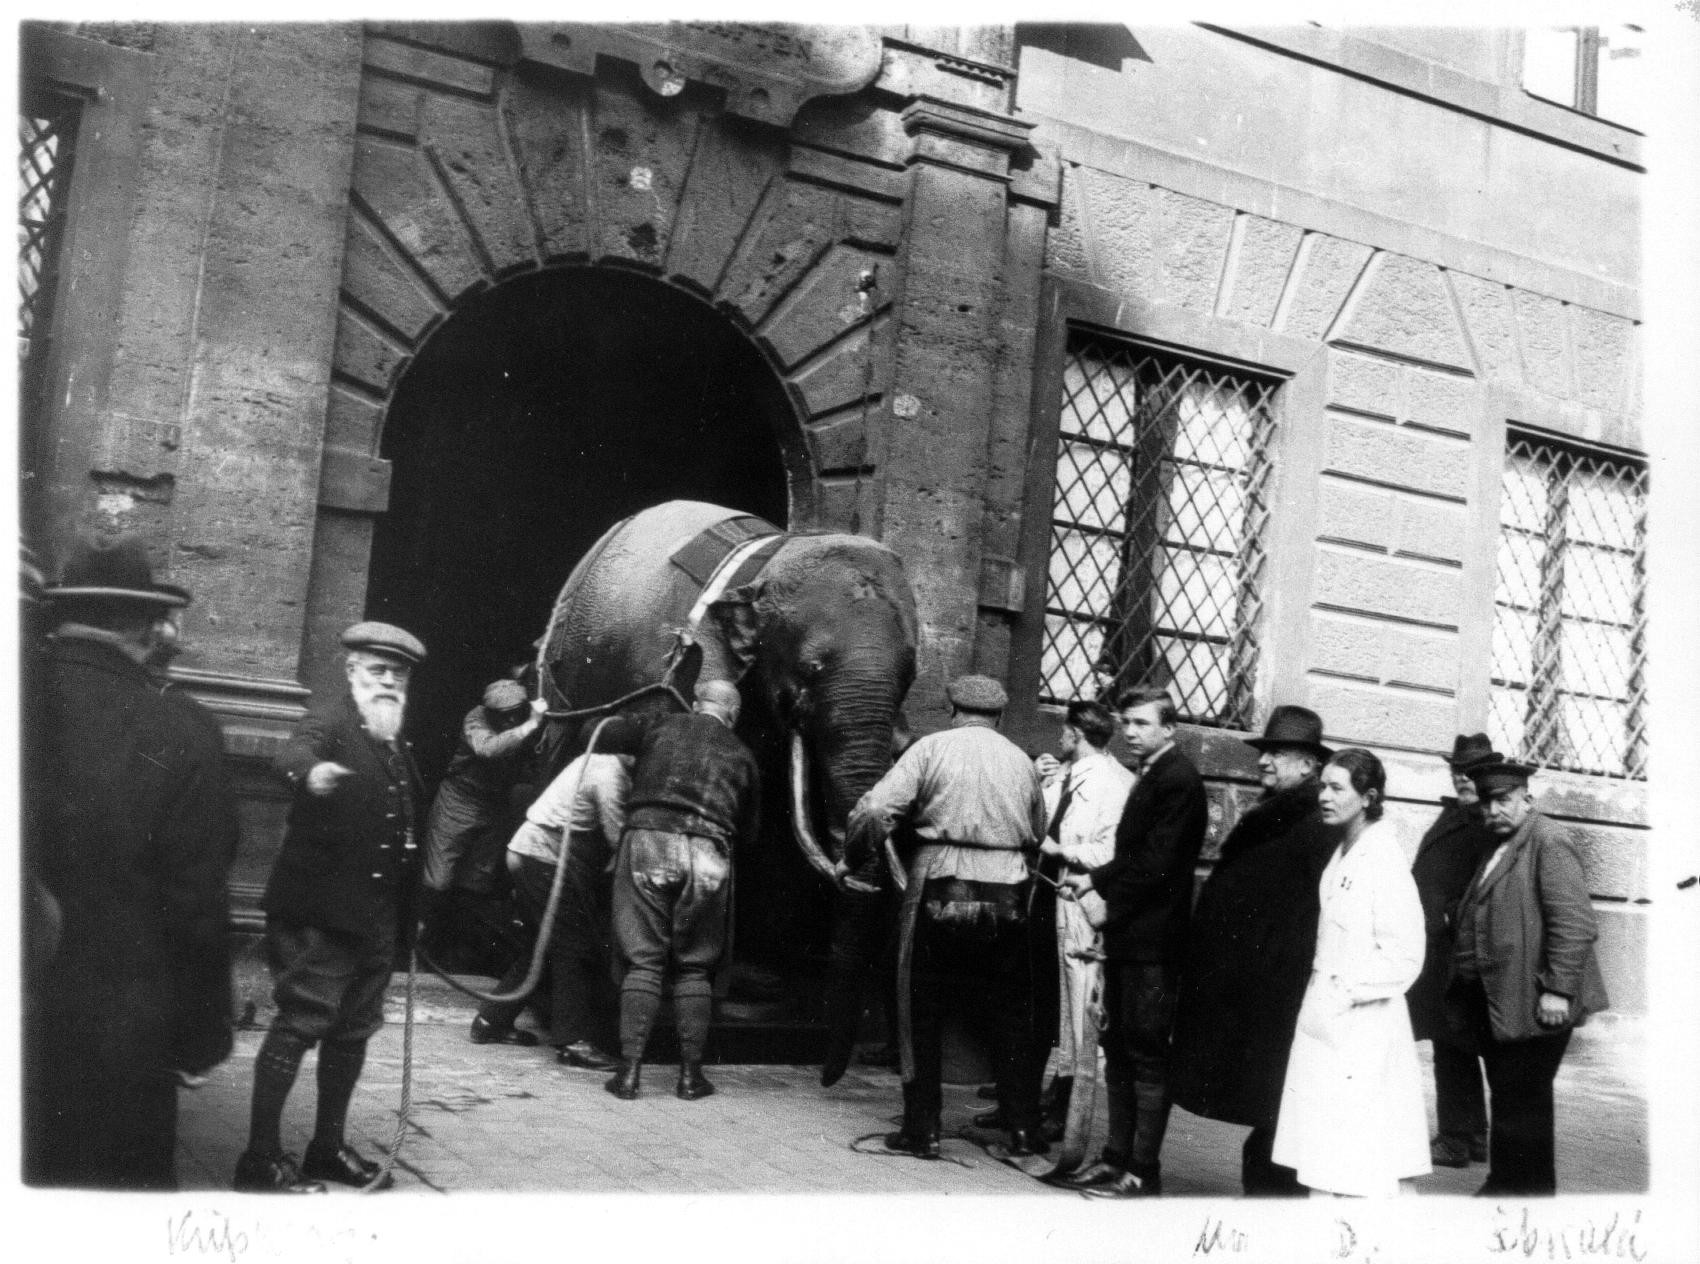 soliman-elephantumzugfoto.jpg